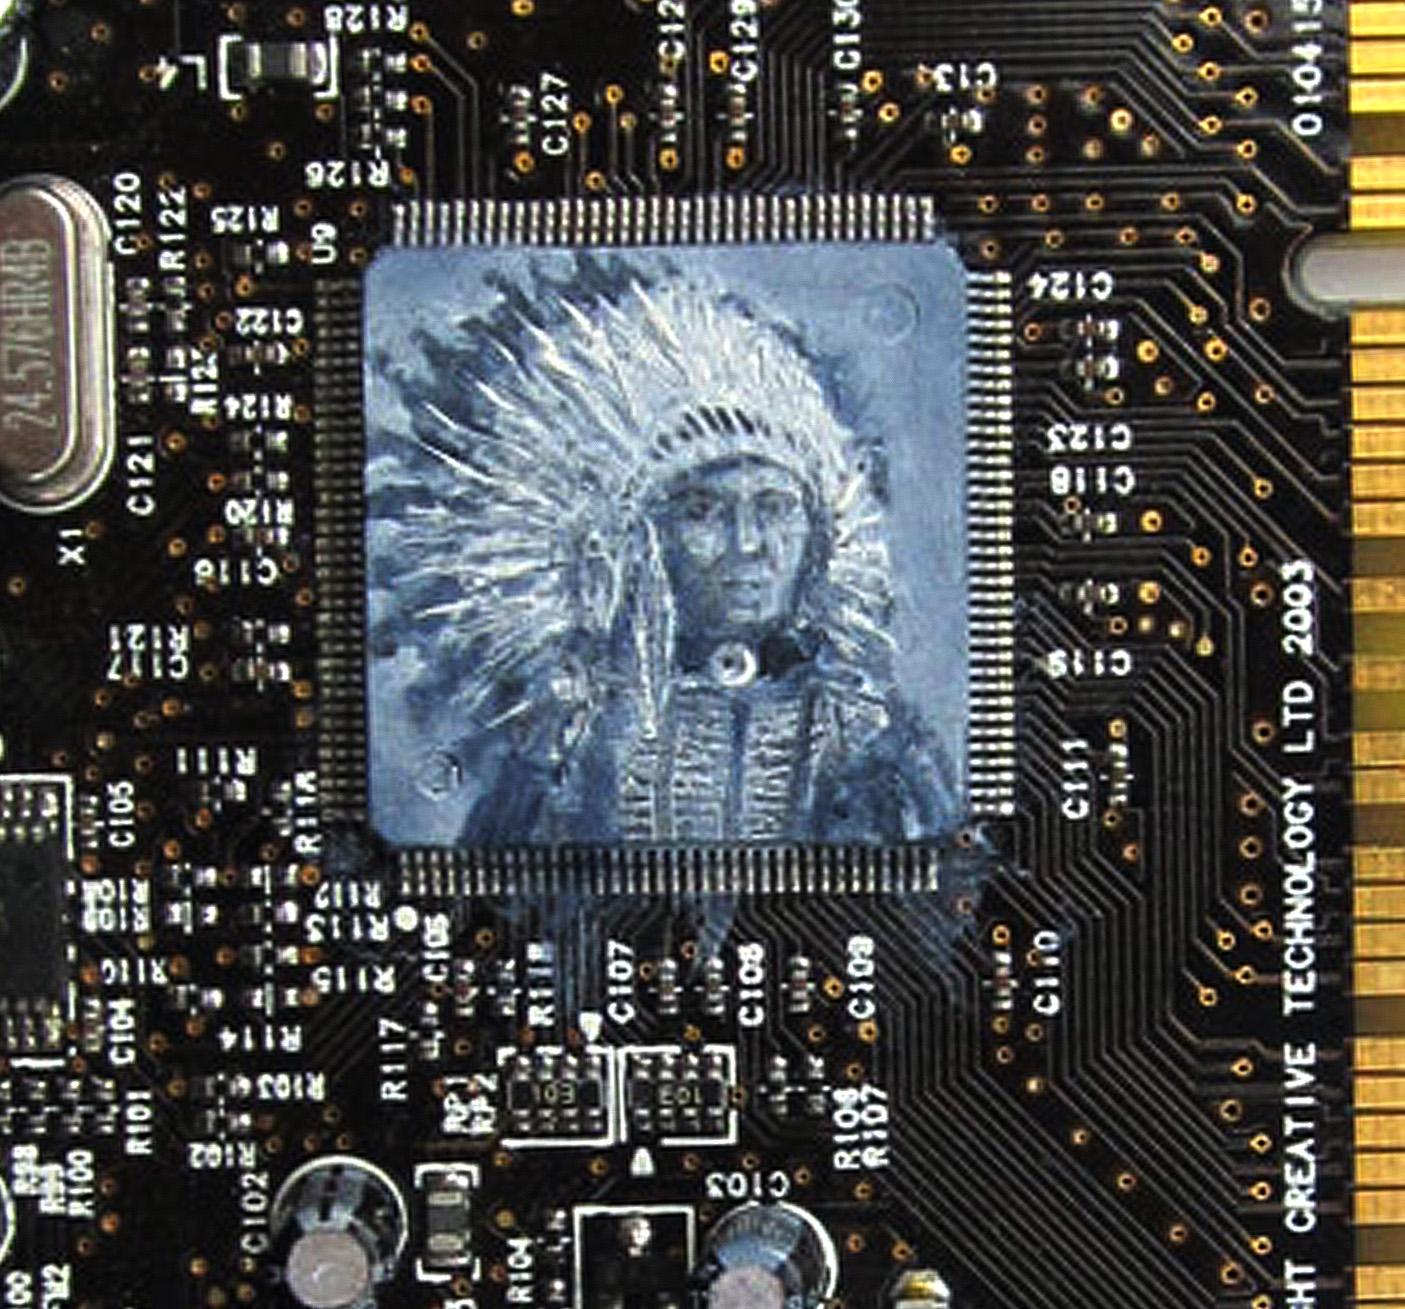 Chief , Oil on circuit board, 20 x 8 cm, 2014